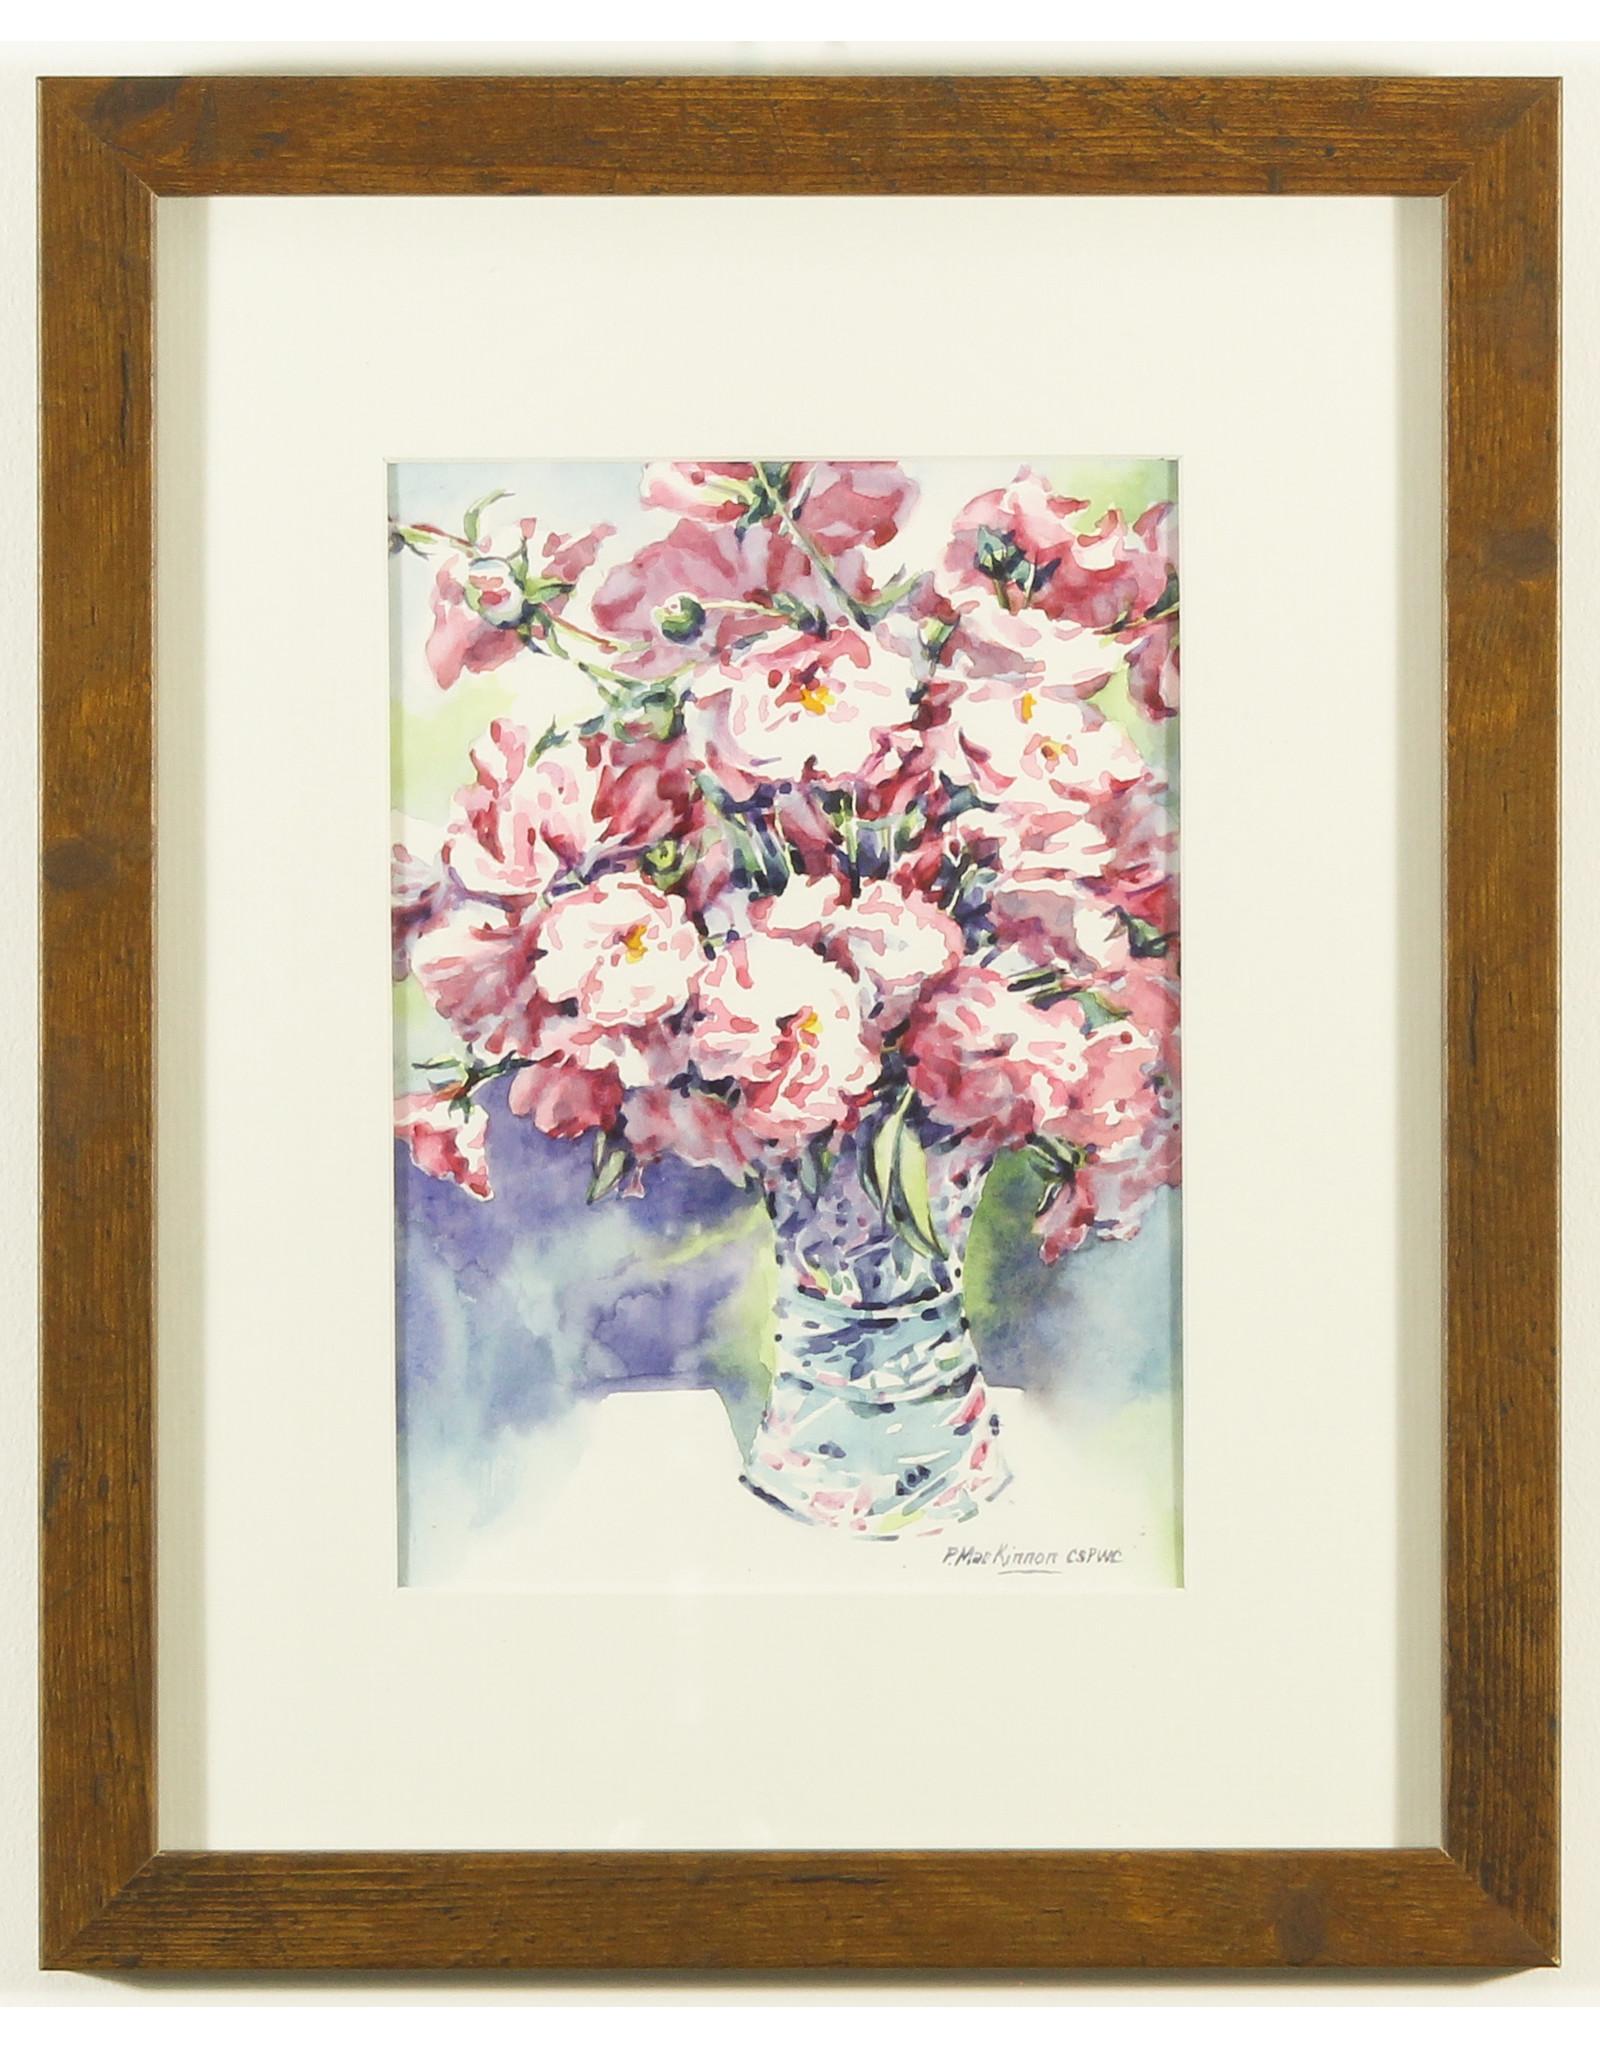 Patsy MacKinnon Garden Pinks by Patsy MacKinnon